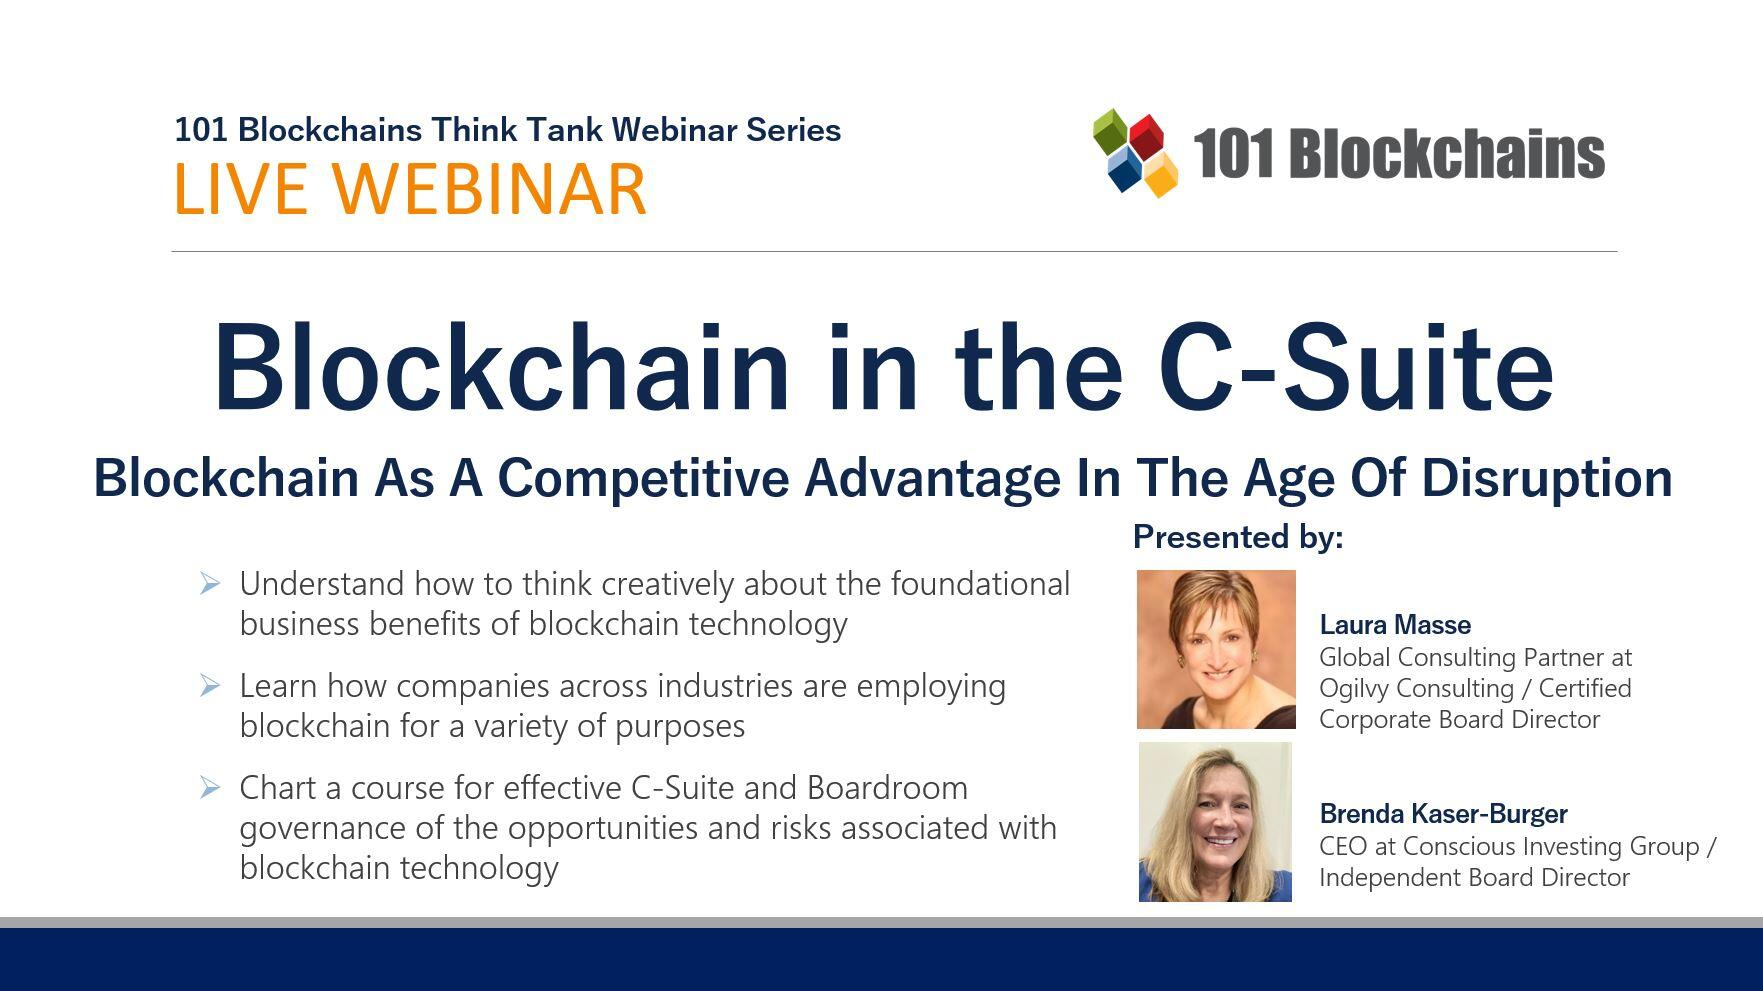 blockchain in the c-suite webinar